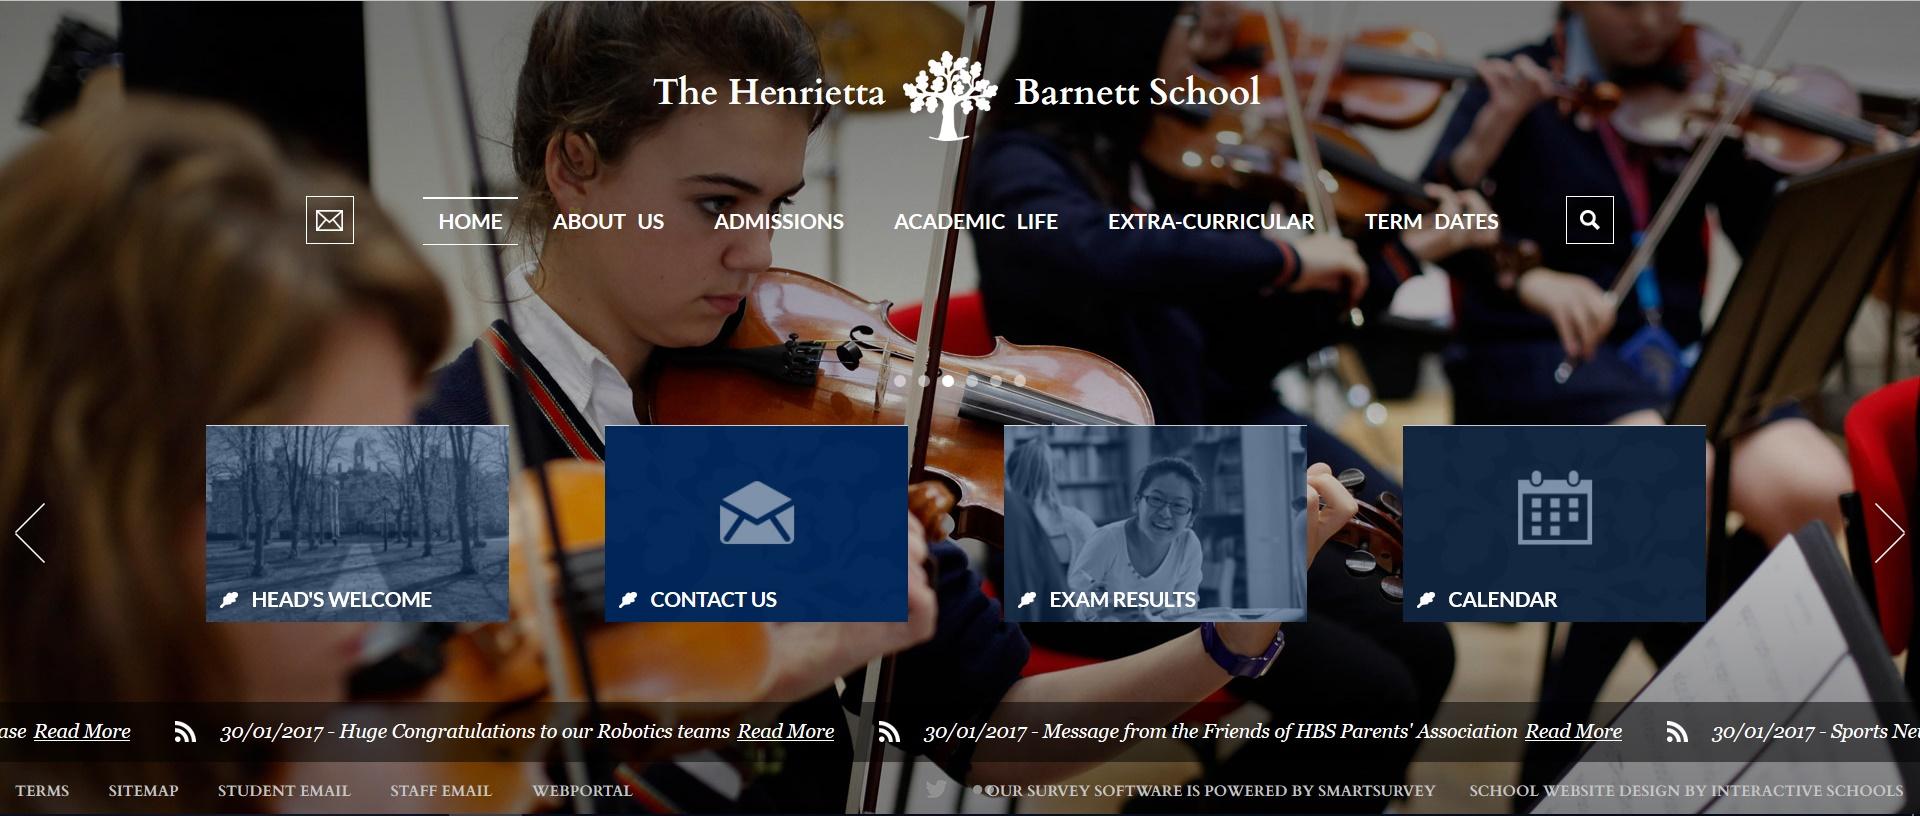 Screenshot of the Henrietta Barnett school home page